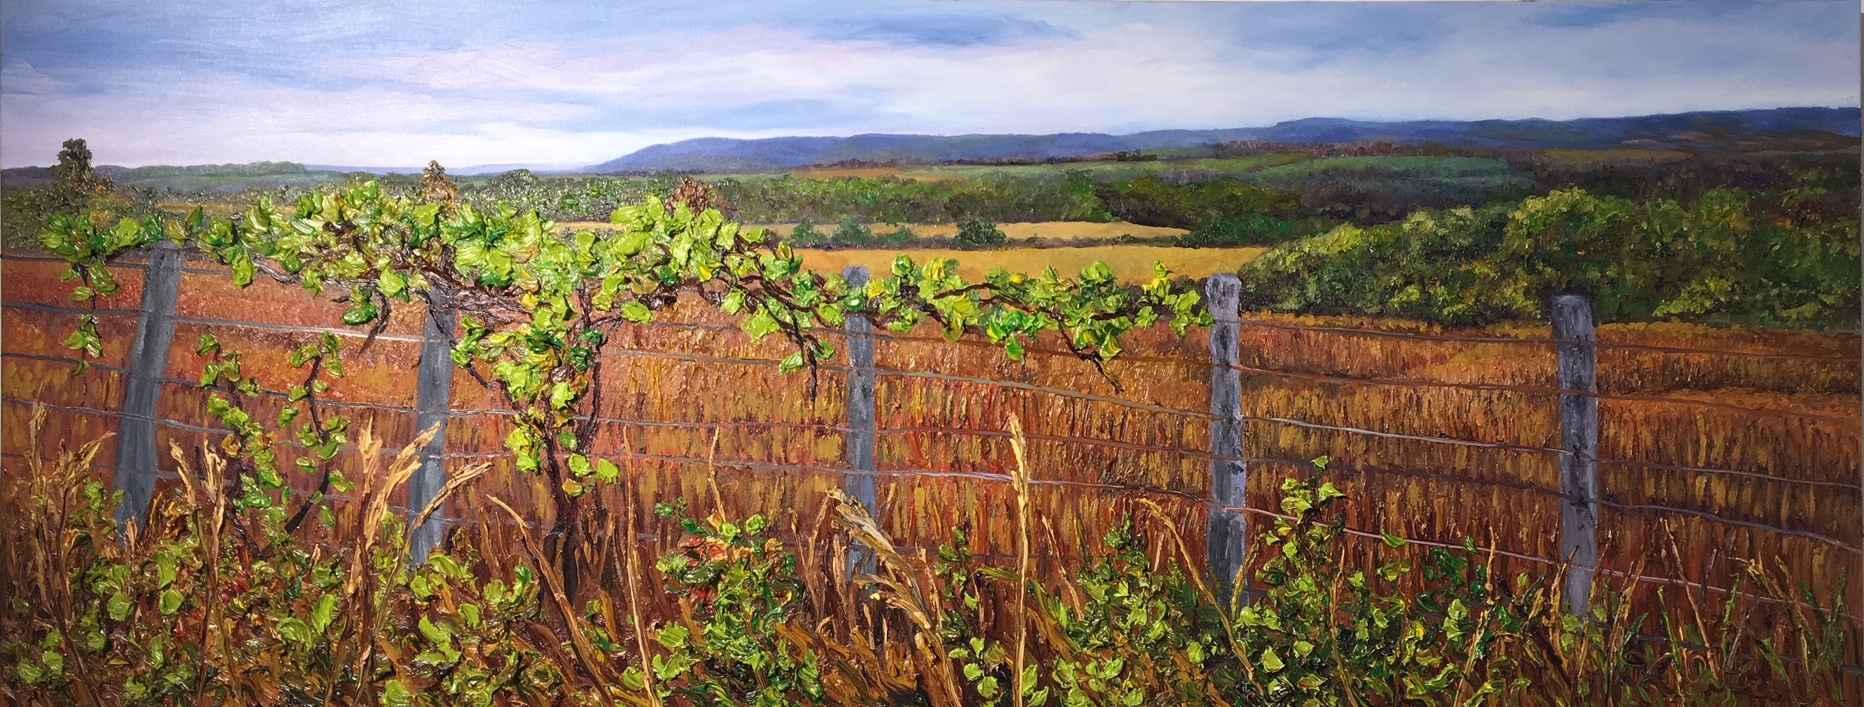 Sitting On the Fence by Ms Debra Lynn Carroll - Masterpiece Online